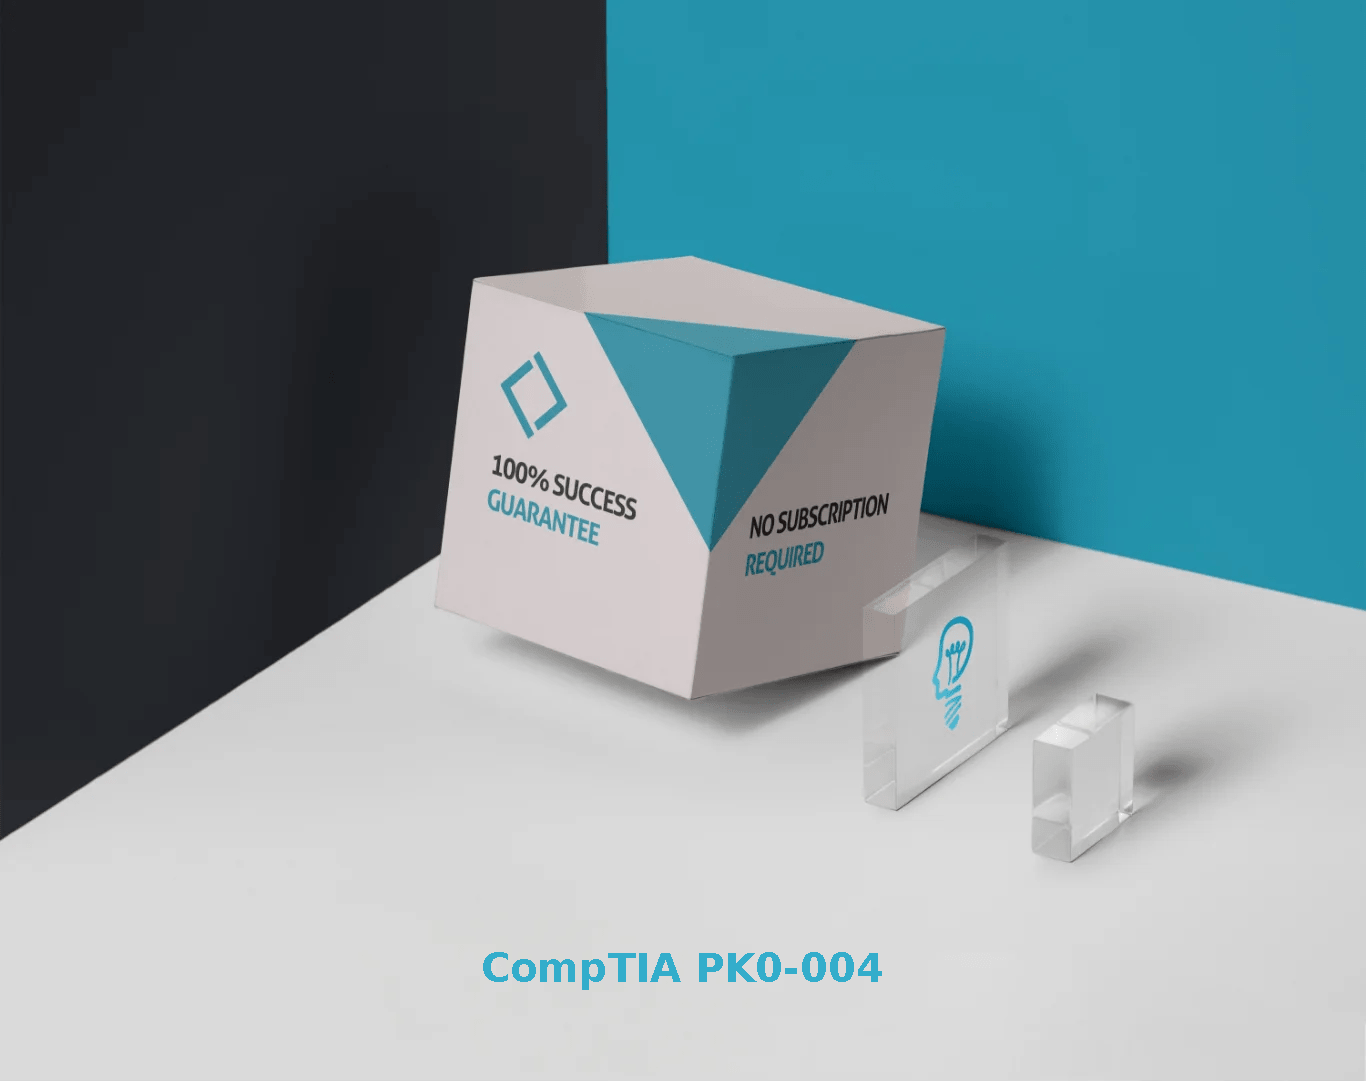 PK0-004 Dumps